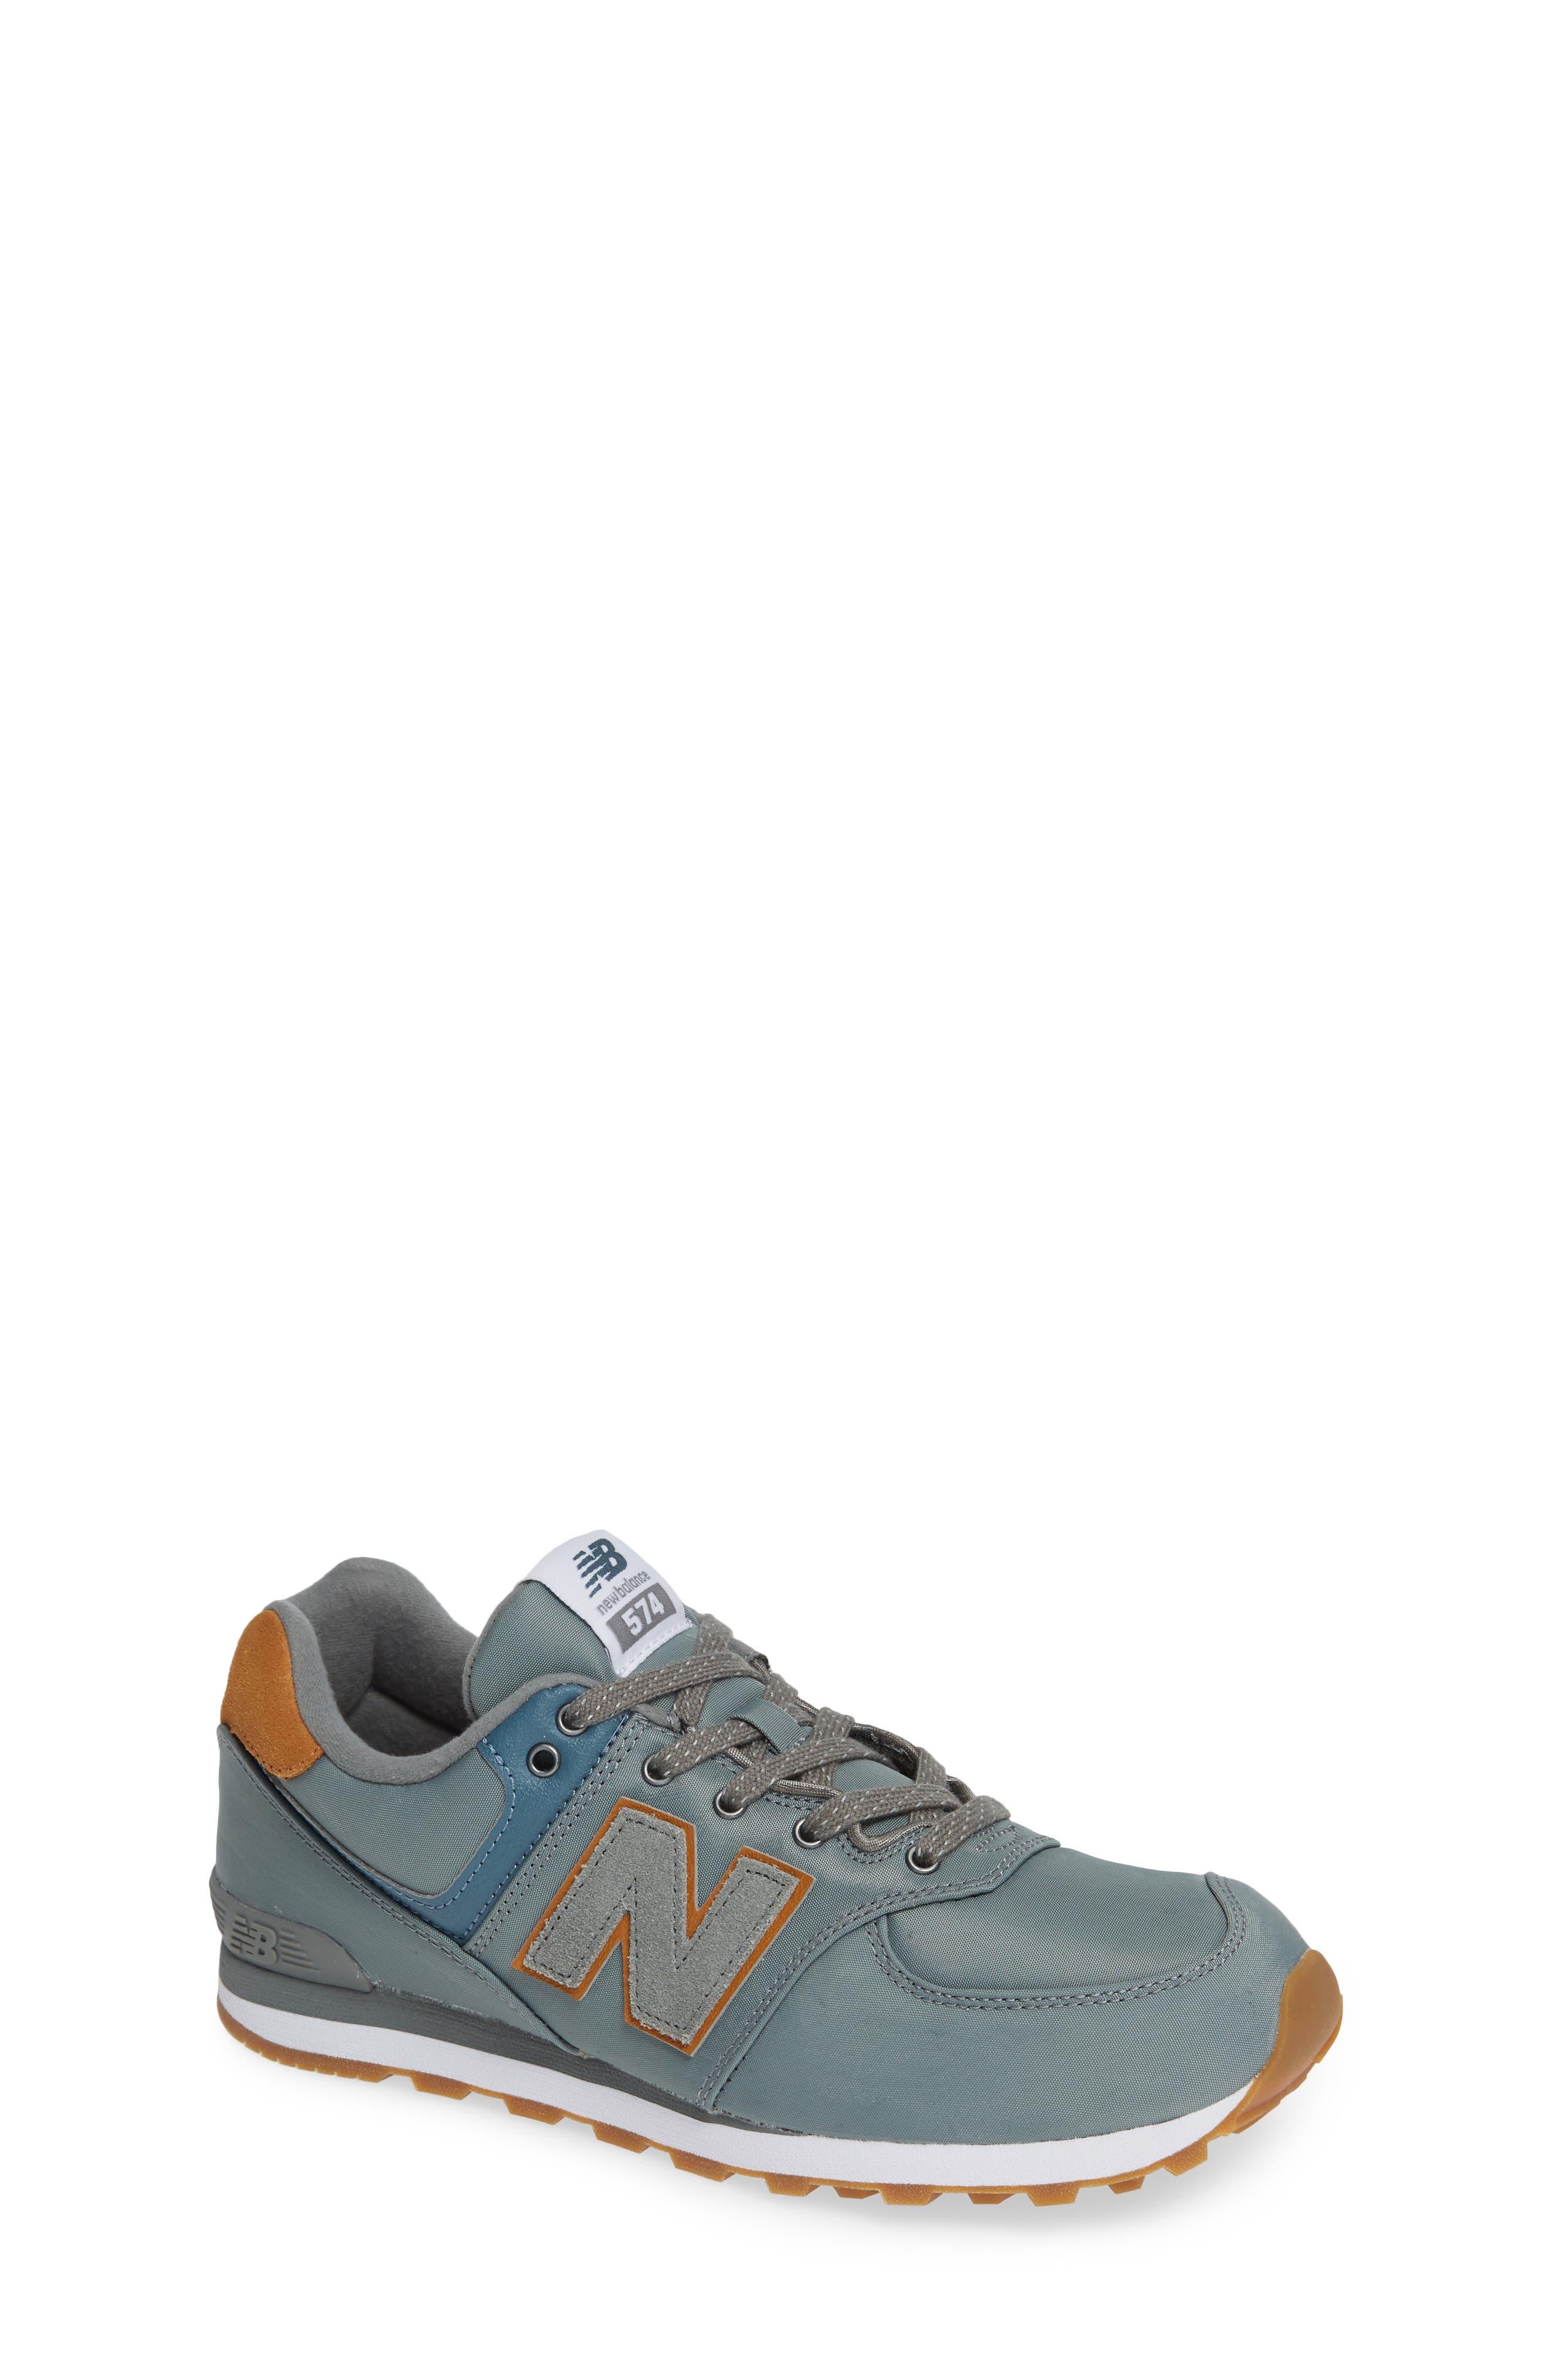 574 Essentials Sneaker,                         Main,                         color, Sedona Sage